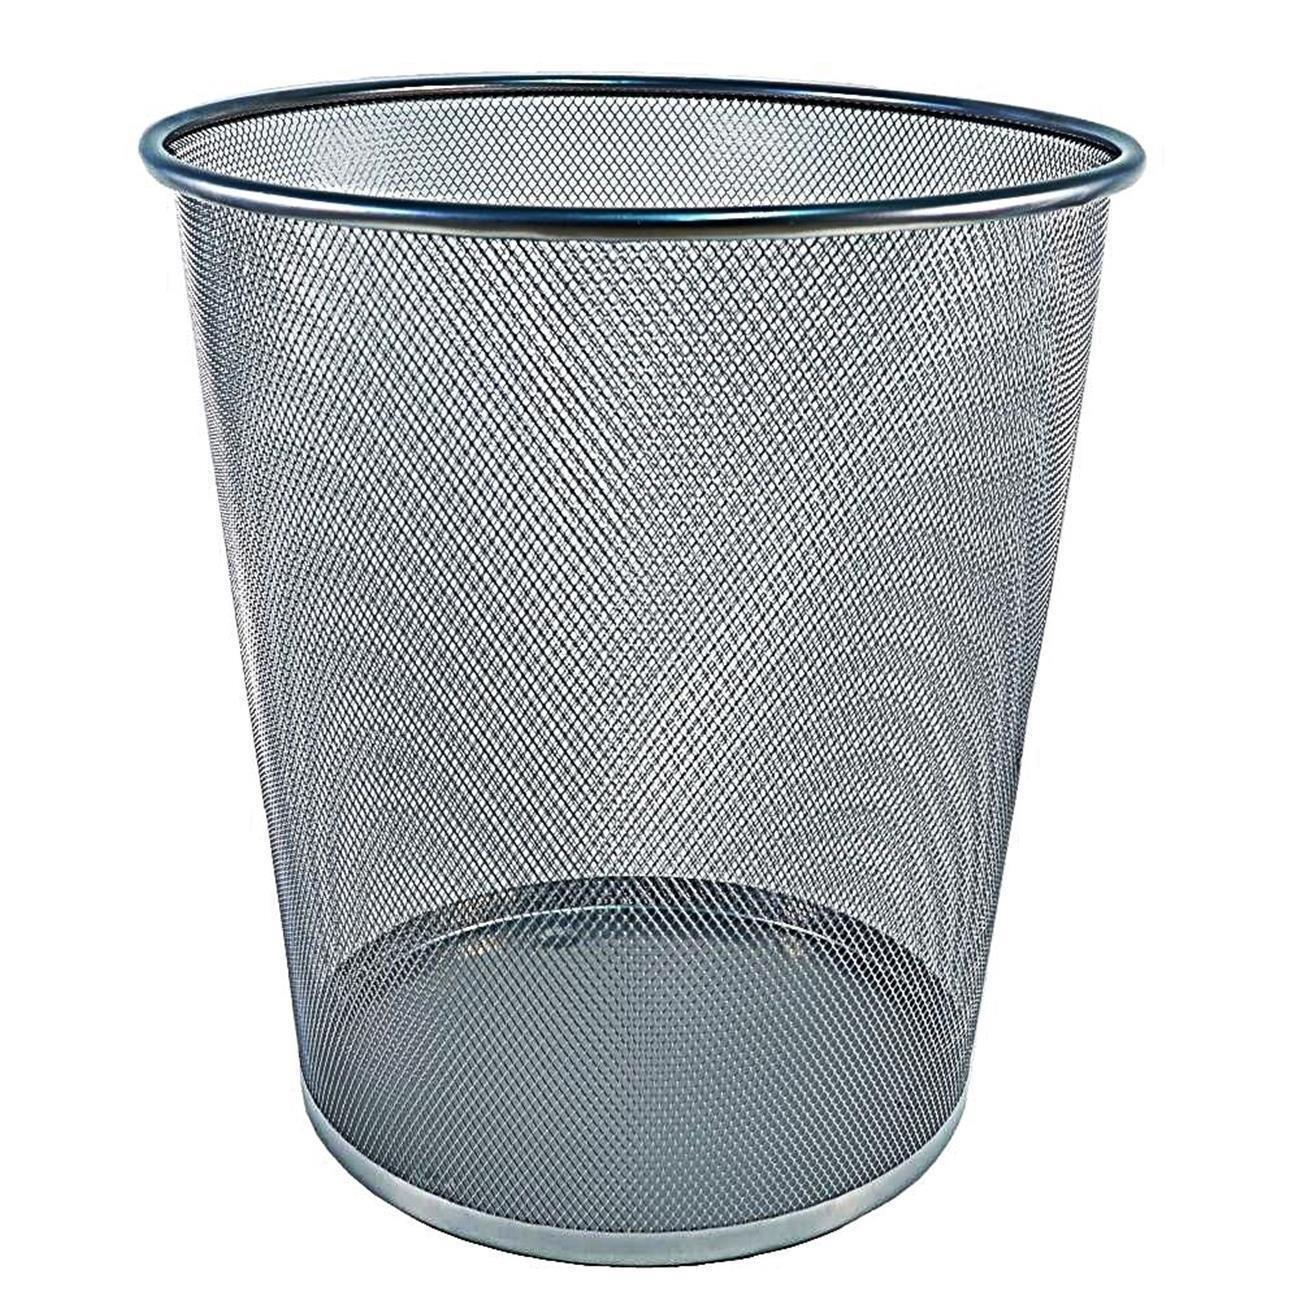 Robuster M/ülleimer aus Draht-Metall Sch/öner Papierkorb in Silber f/ür ca 19,5 Liter